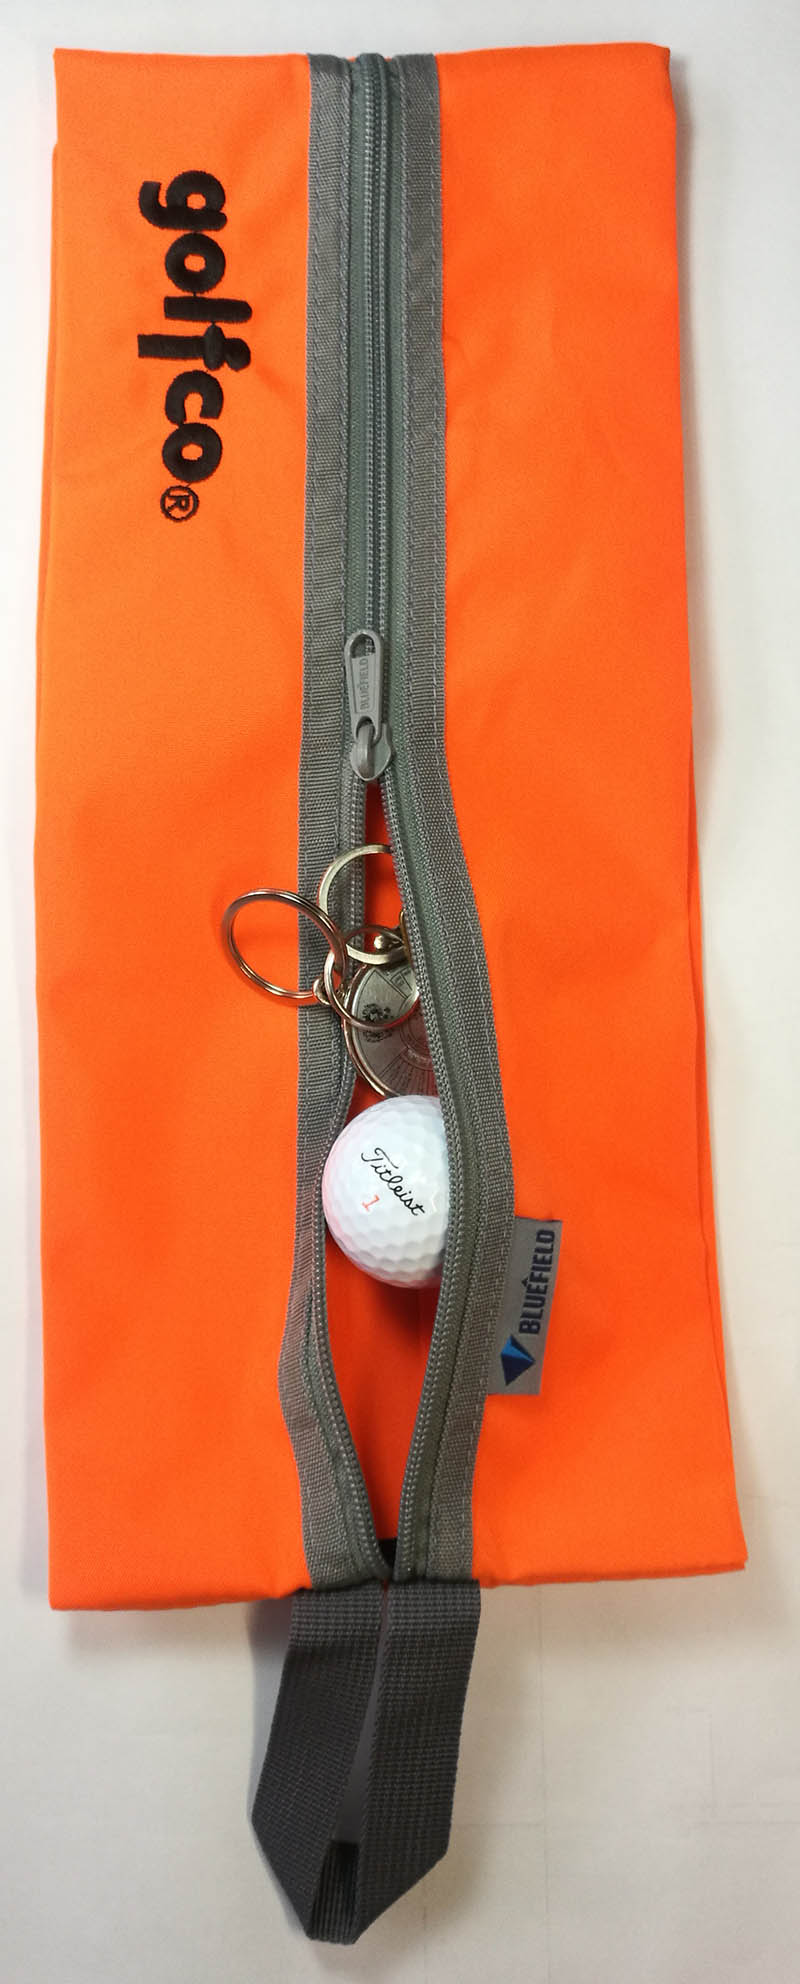 Esstuche golfco organizador de bolas de golf y otros Naranja 01